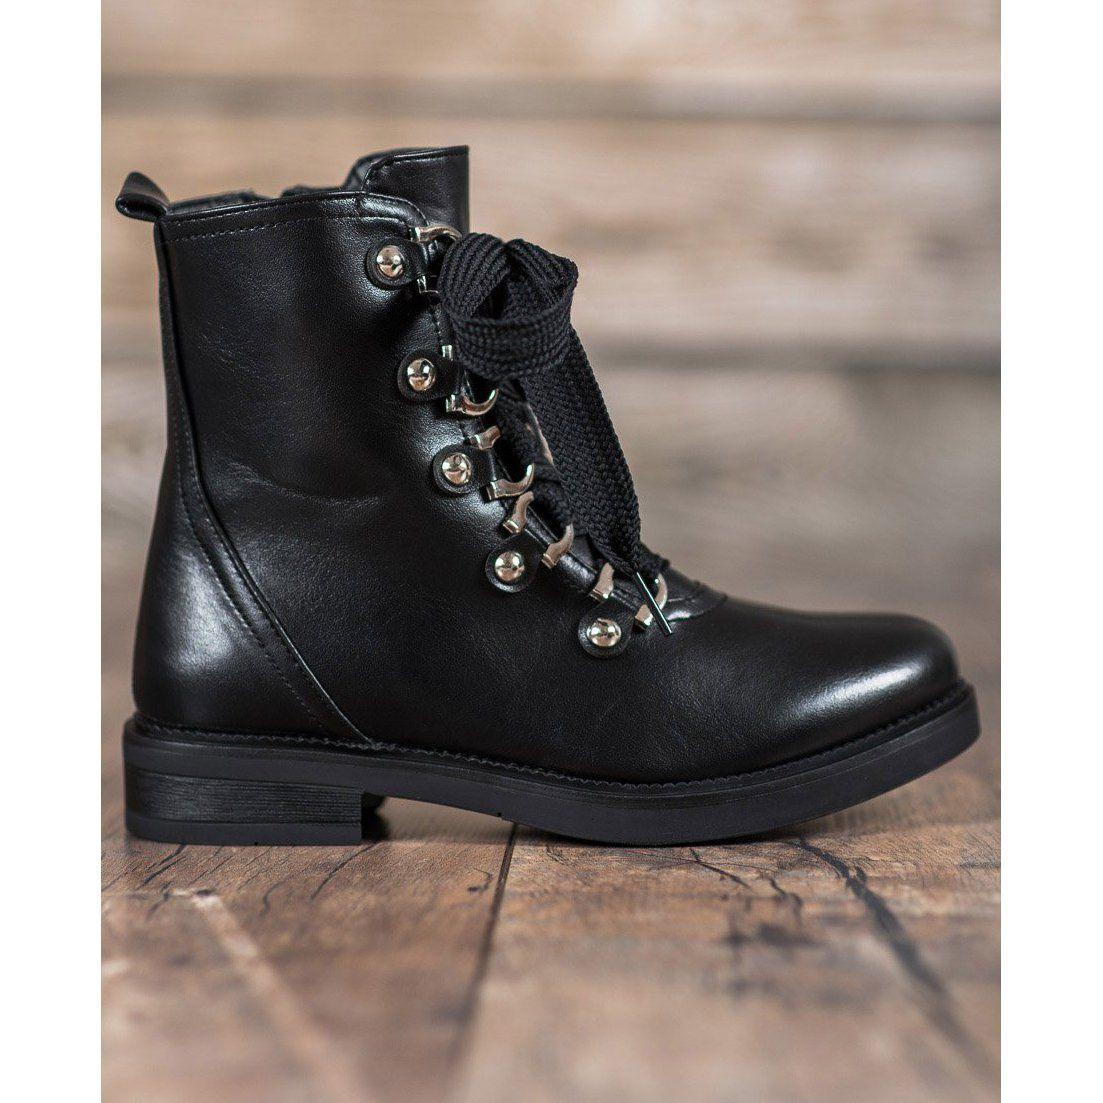 Damskie Shelovet Shelovet Sznurowane Botki Biker Boot Shoes Boots